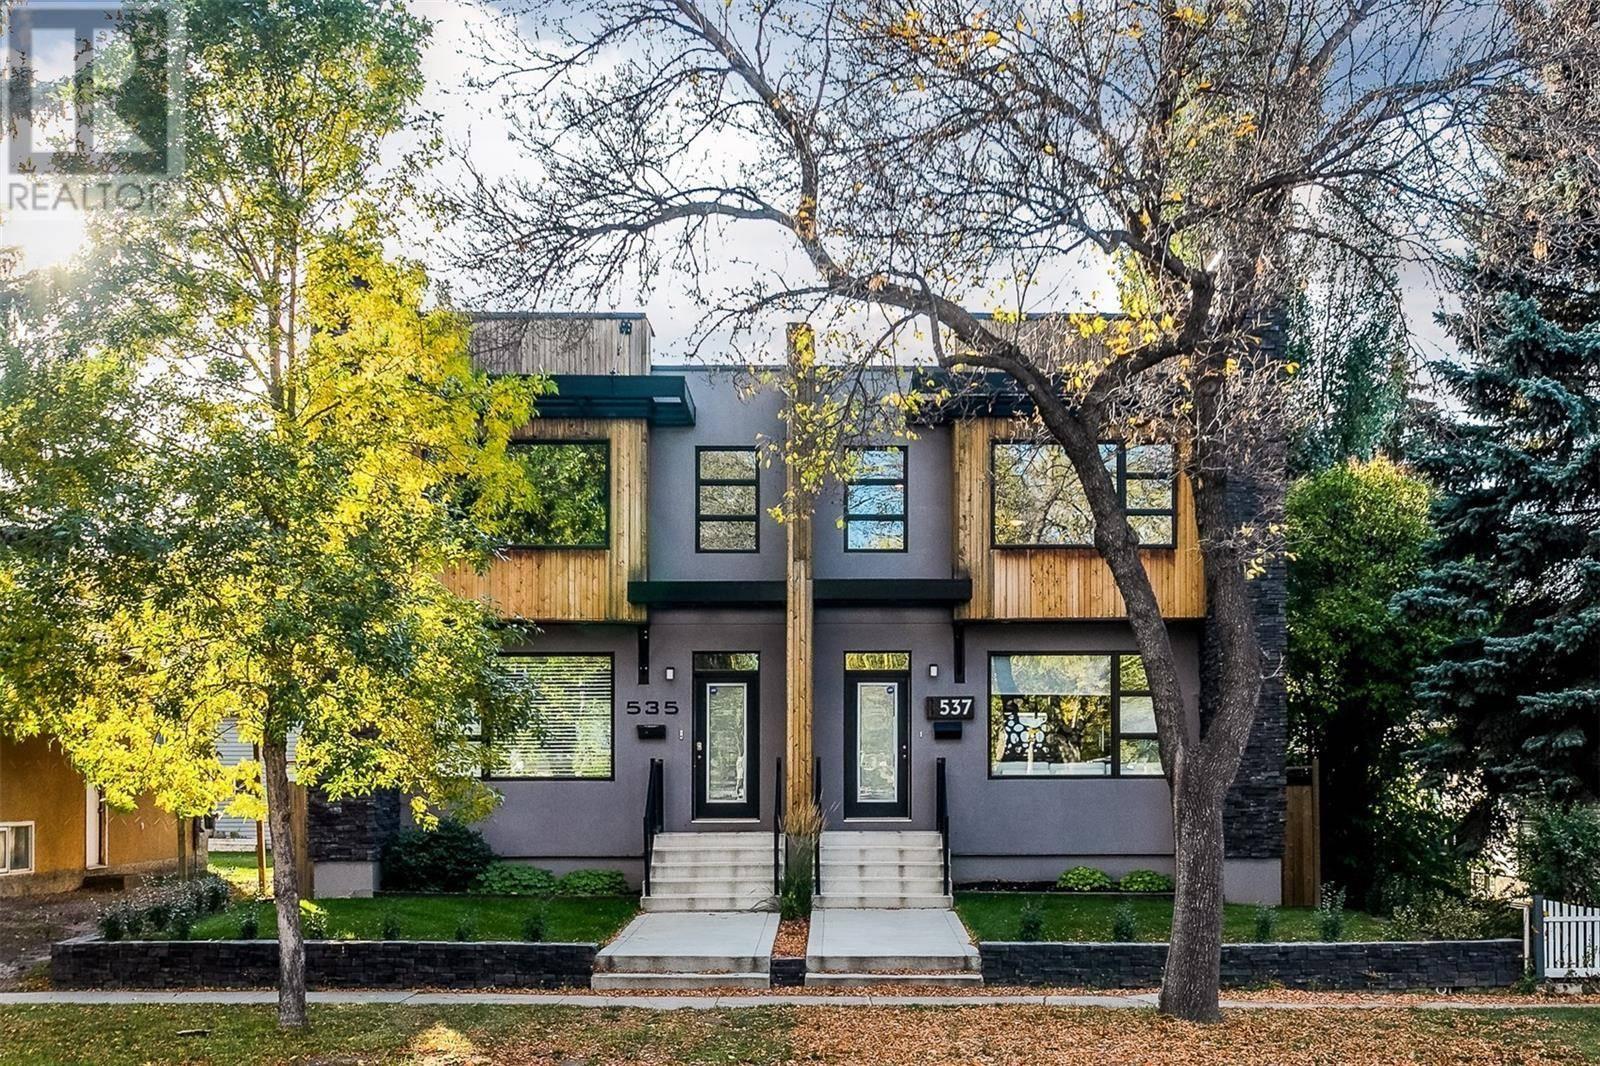 House for sale at 535 H Ave N Saskatoon Saskatchewan - MLS: SK791356